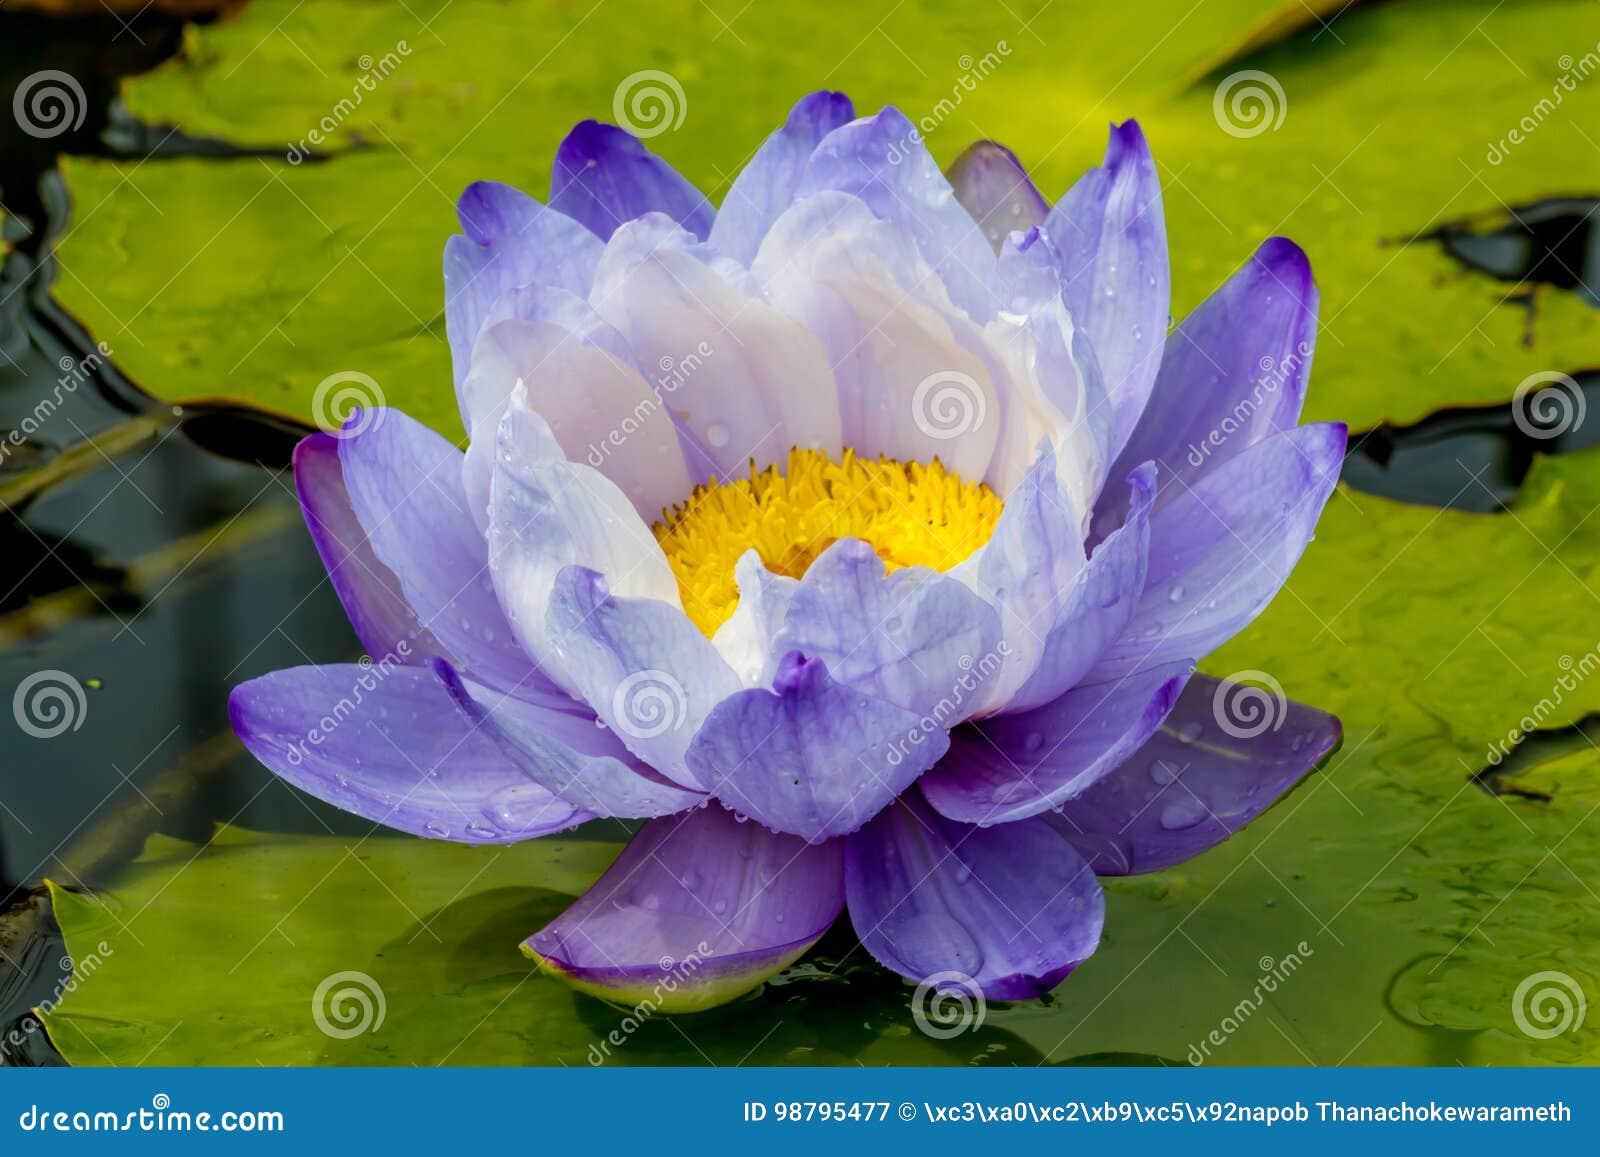 Beautiful lotus flower is the symbol of the buddha thailand stock download beautiful lotus flower is the symbol of the buddha thailand stock image izmirmasajfo